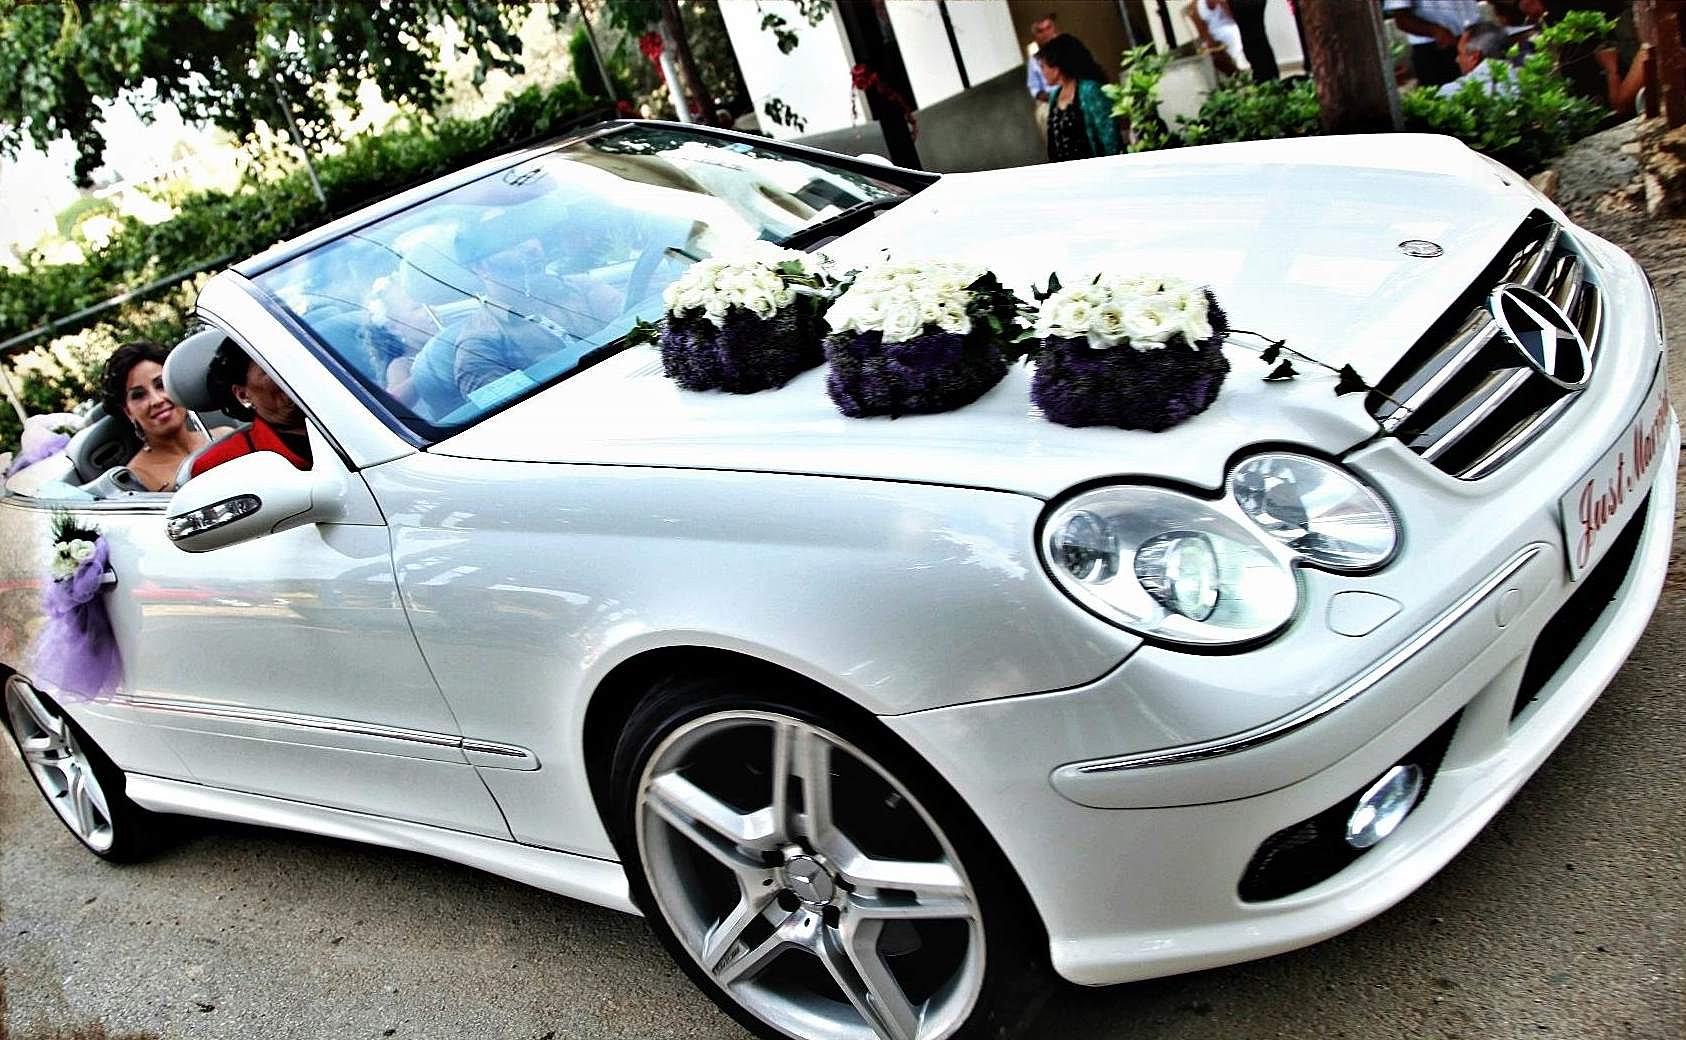 Wedding flowers Lebanon, Chocolates Souvenirs, Carriage ...